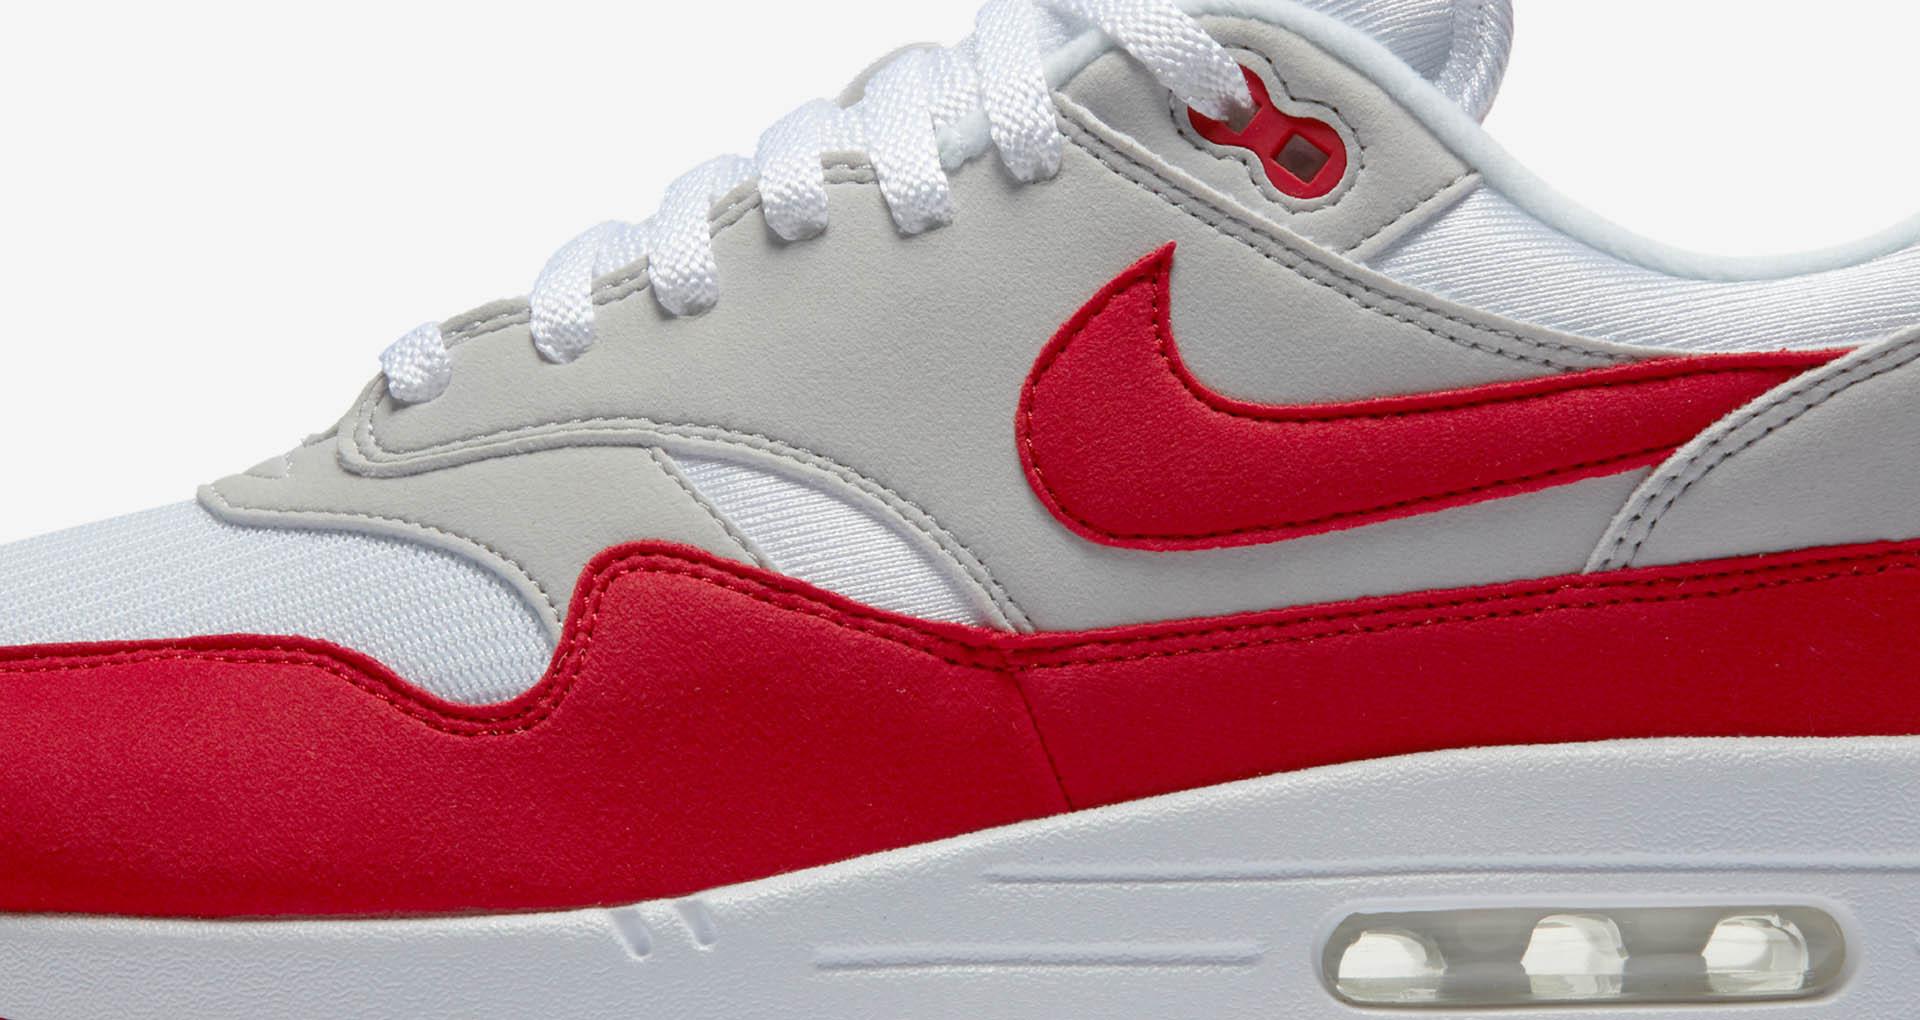 purchase cheap 5c67f 46550 ... Nike Air Max, à l origine du succès